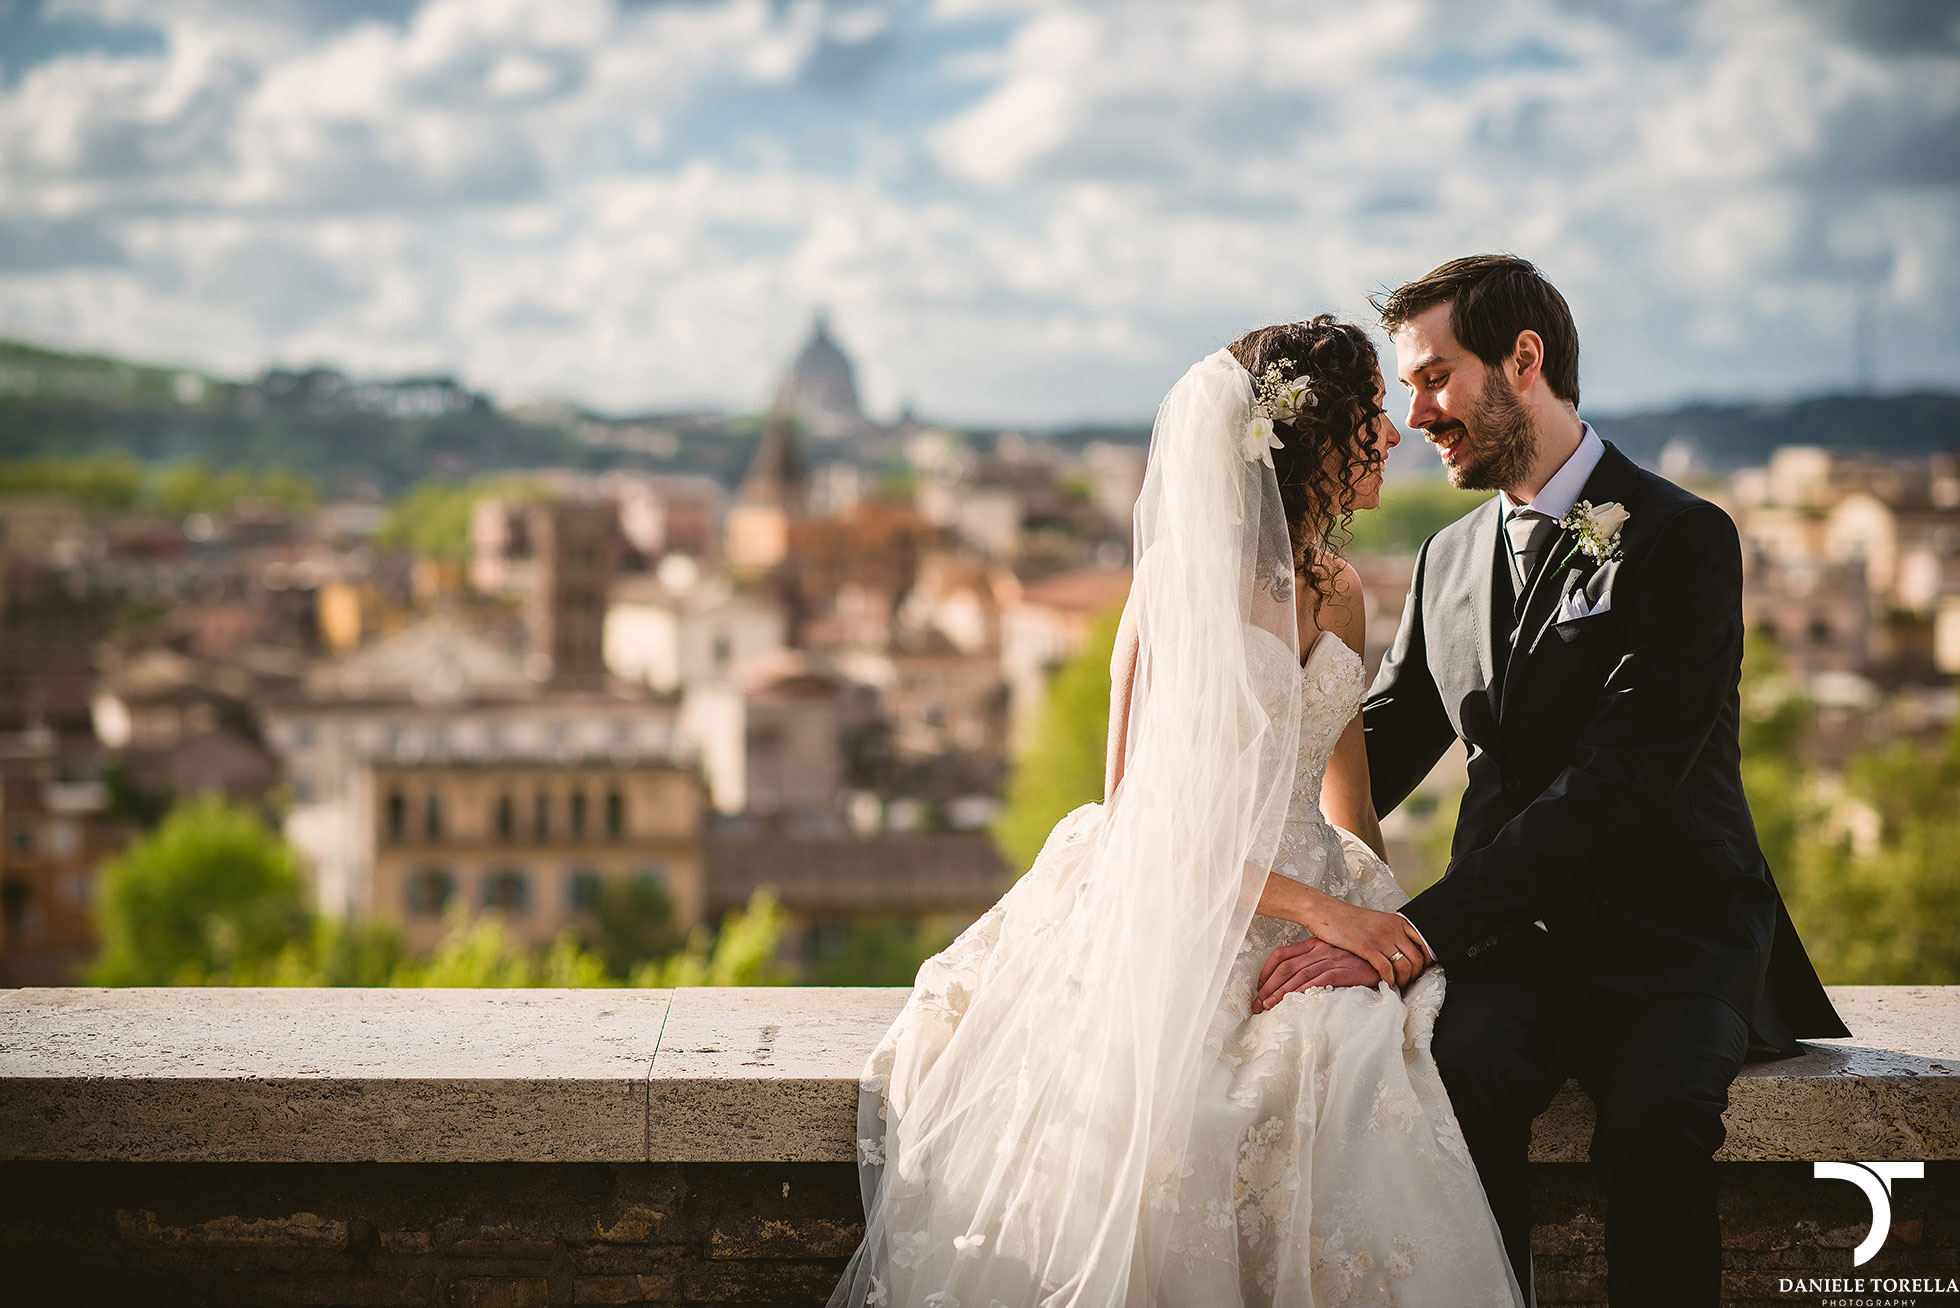 Matrimonio In Vigna : Wedding in vigna san sebastiano